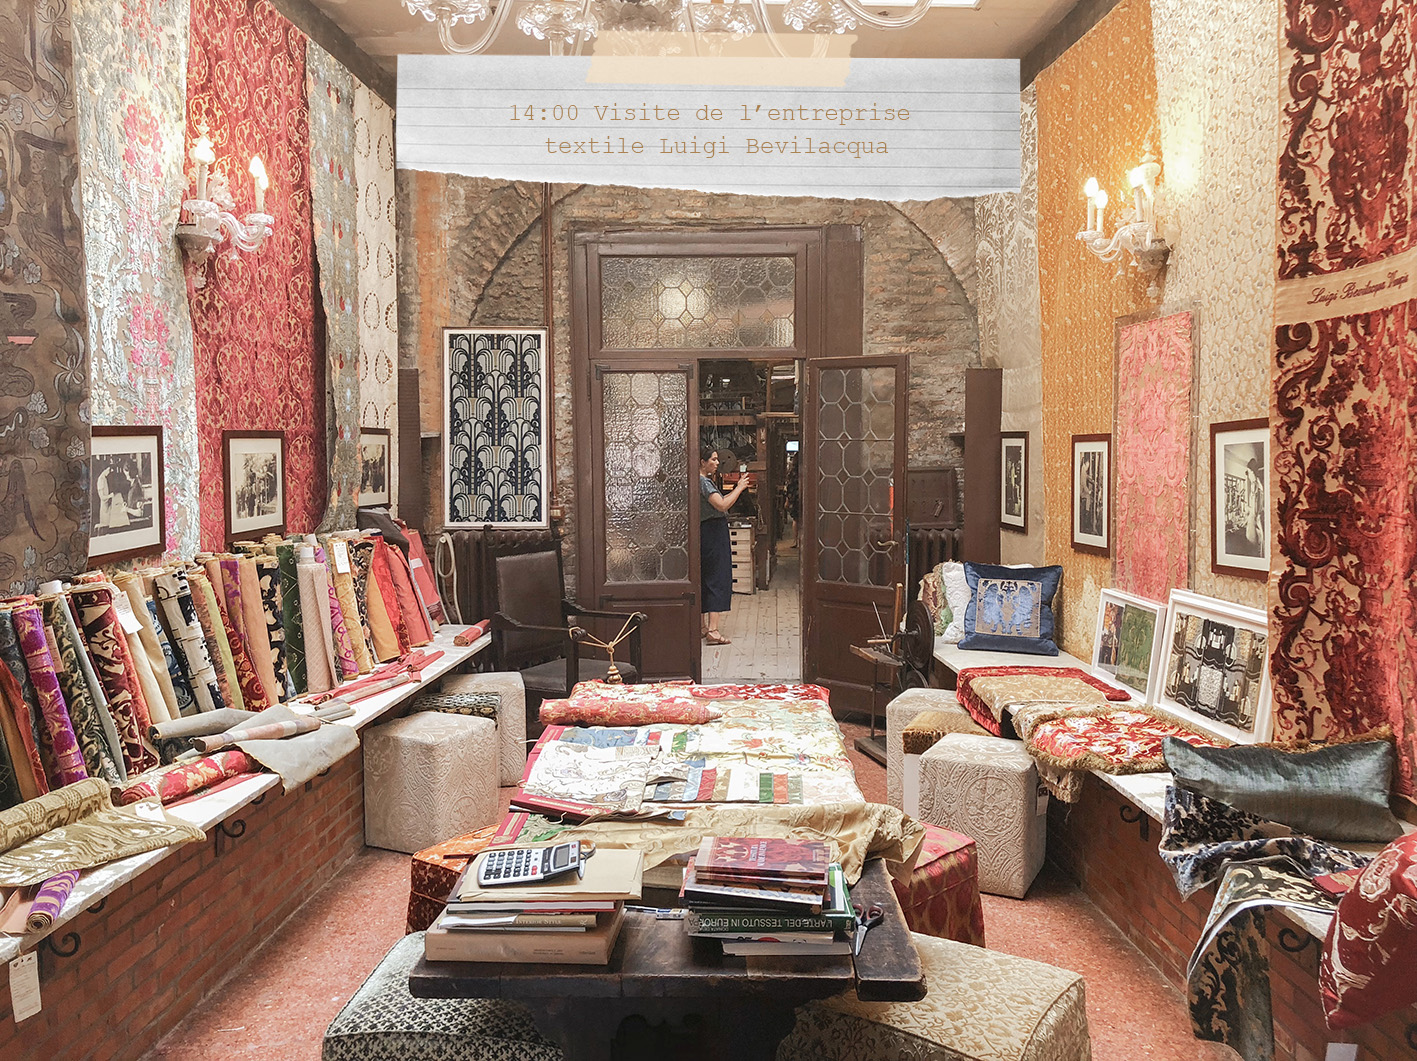 entreprise-textile-luigi-bevilucqua